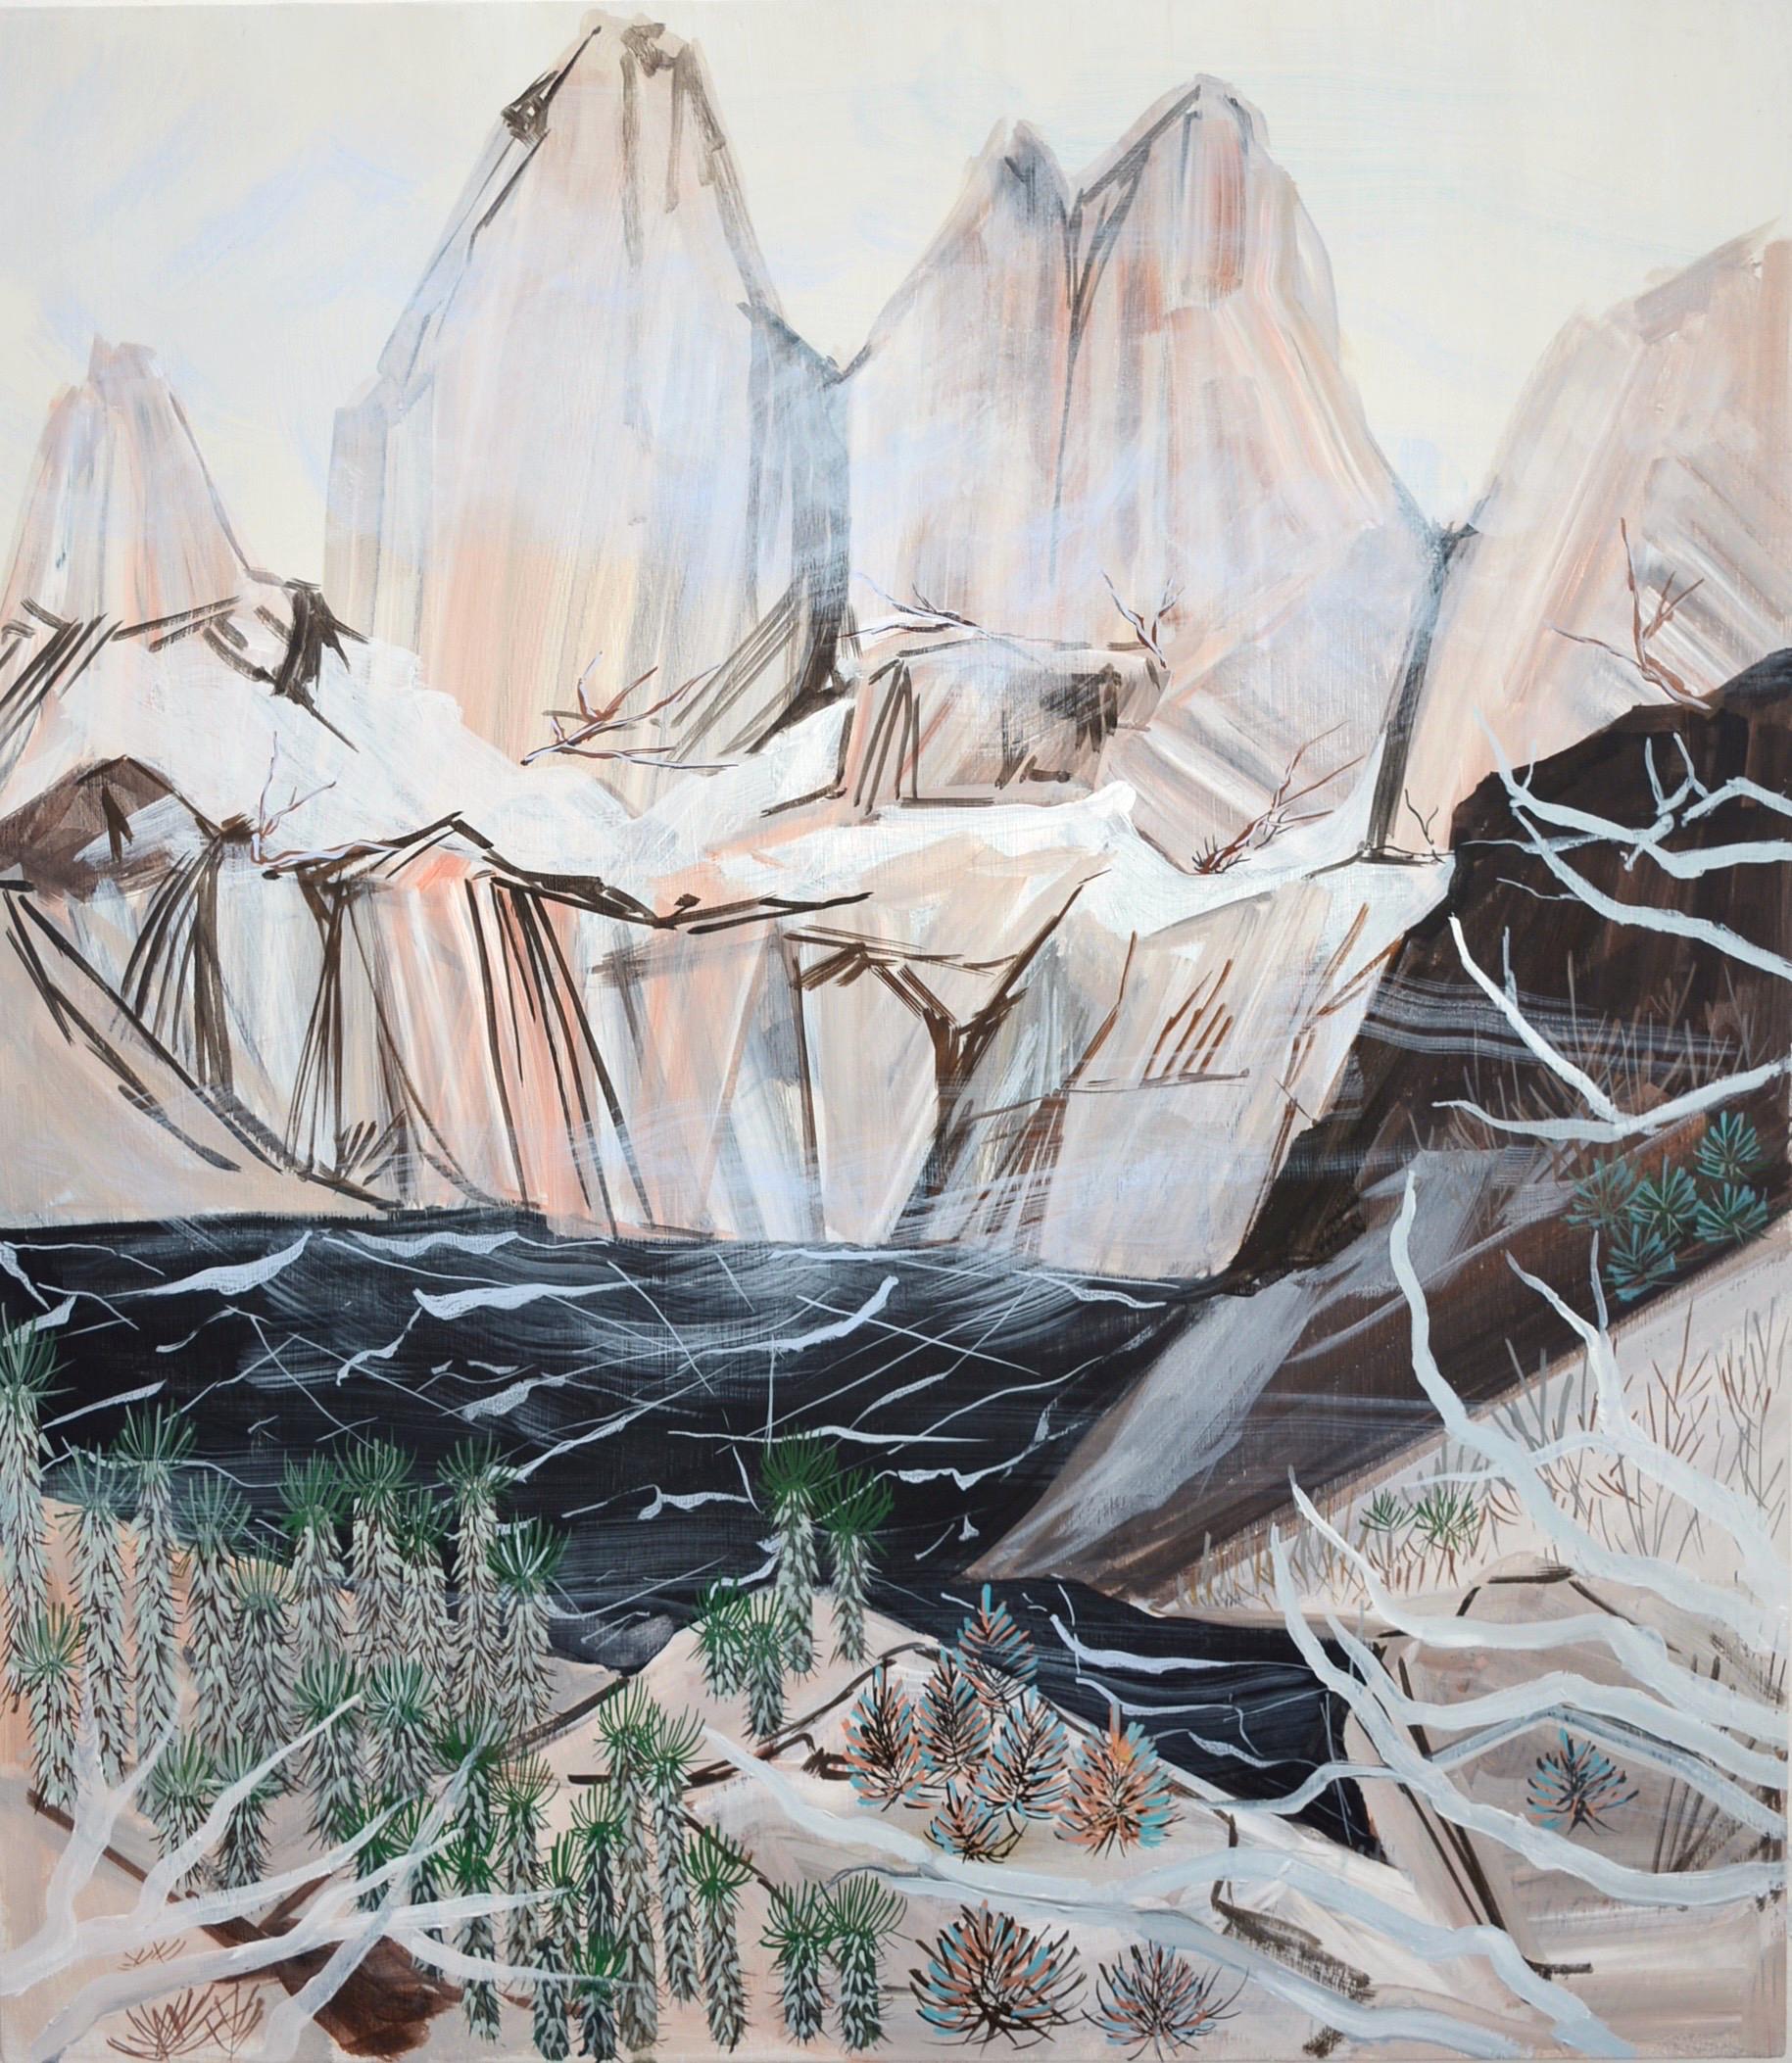 Erika Duque, Black Lake Mountain, acrylic pigment on wood panel.